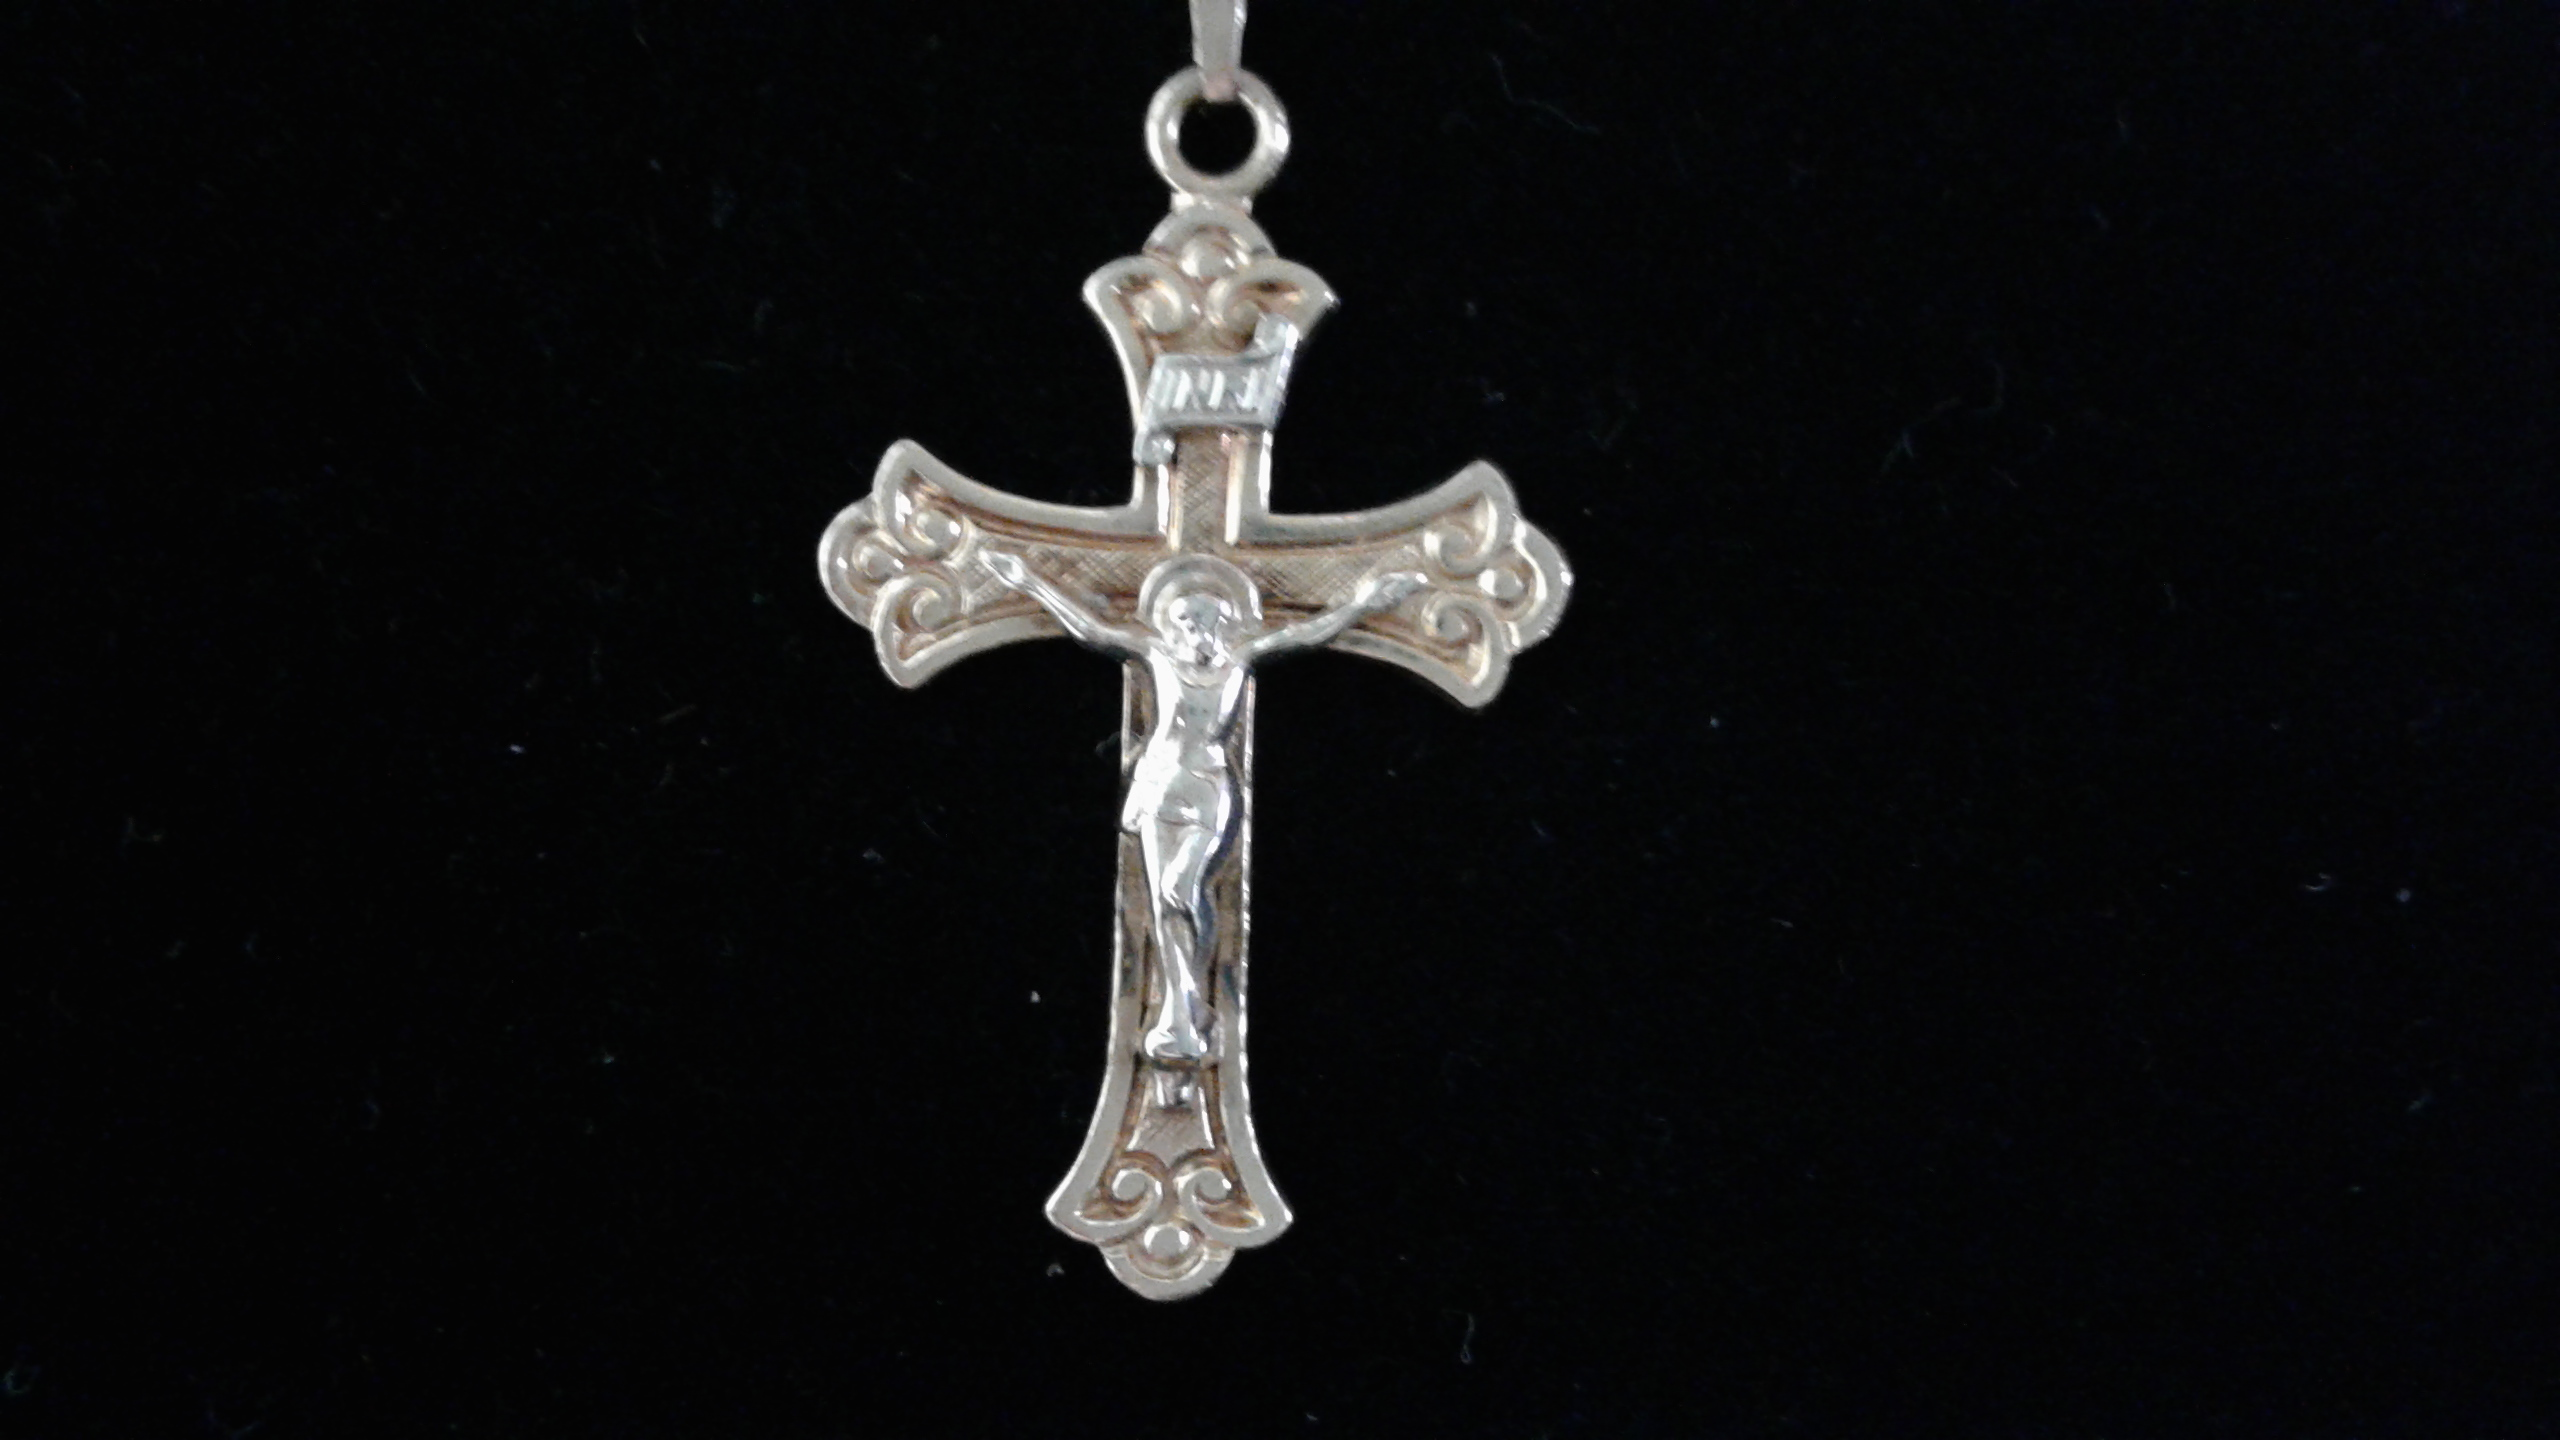 14KT - Yellow Gold - Cross - Charm - 1.5 Grams - crucifix